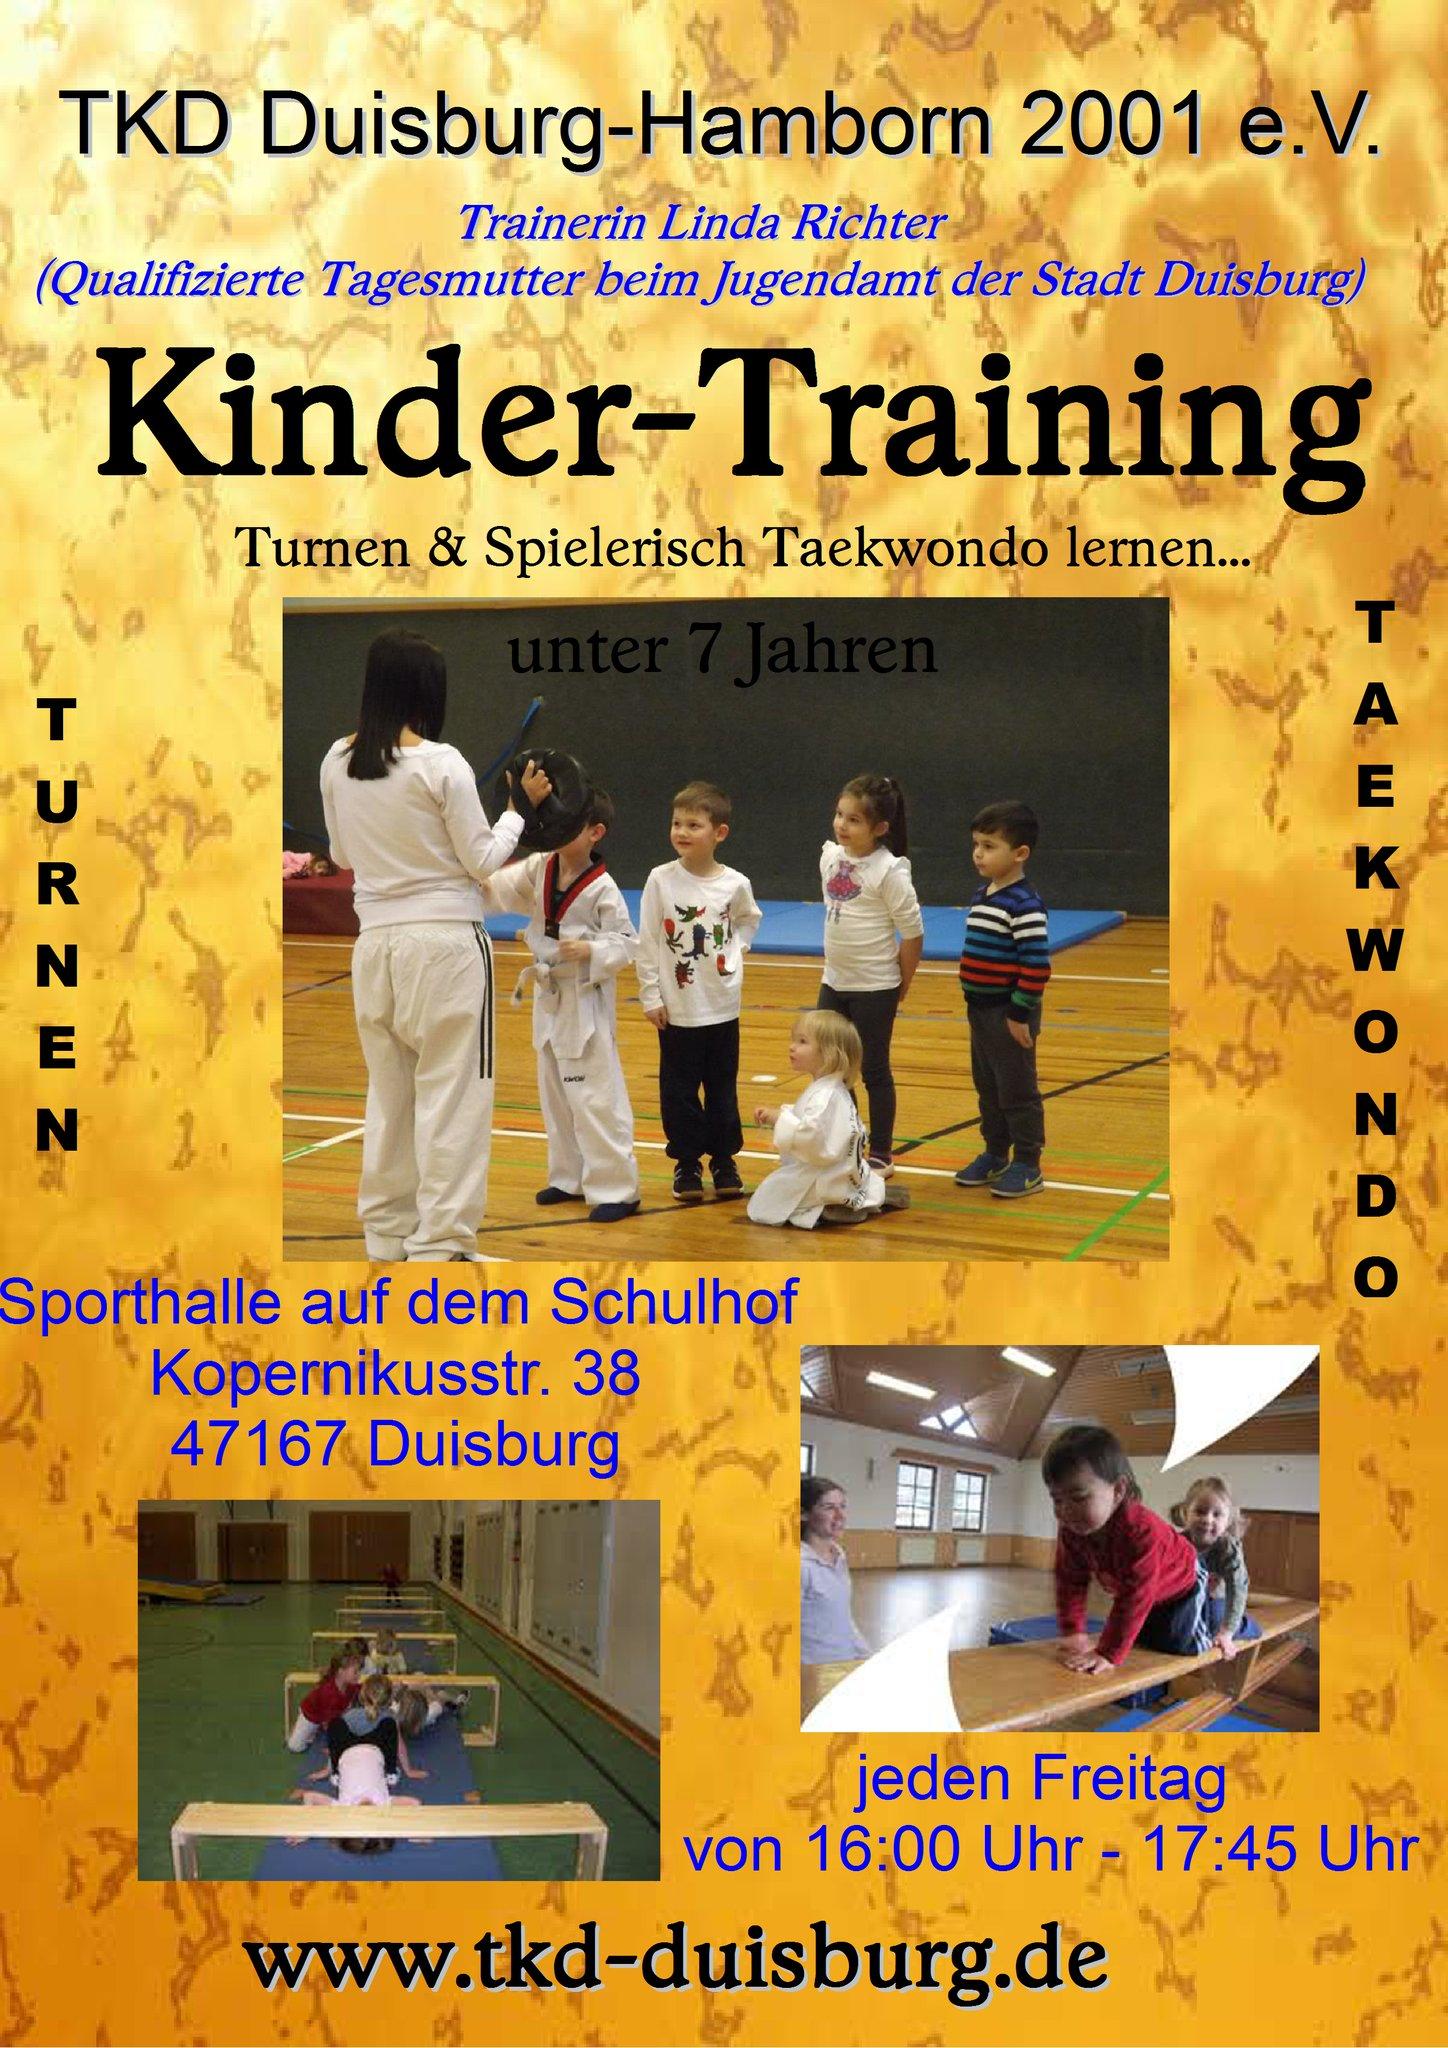 Neuer Kurs Beim Taekwondo Duisburg Hamborn 2001 E V Duisburg